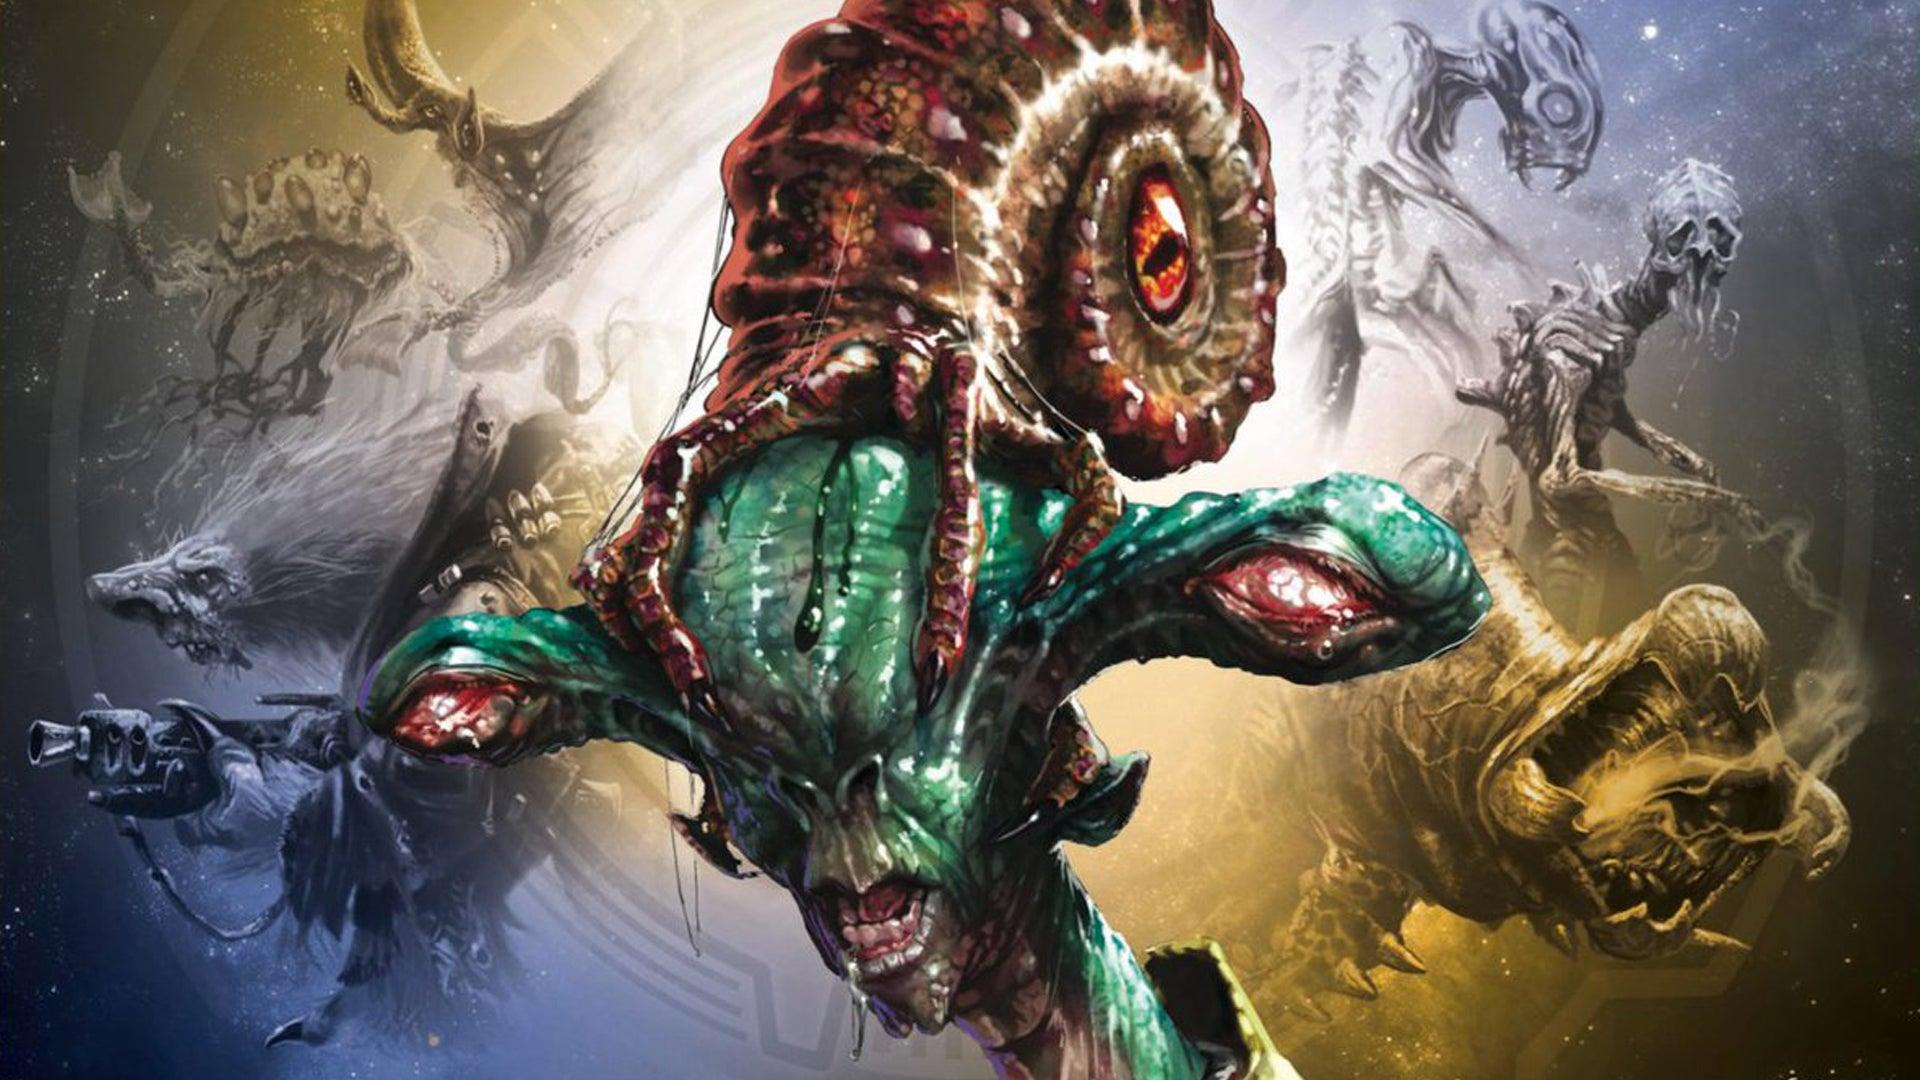 cosmic-encounter-board-game-box-artwork.jpg